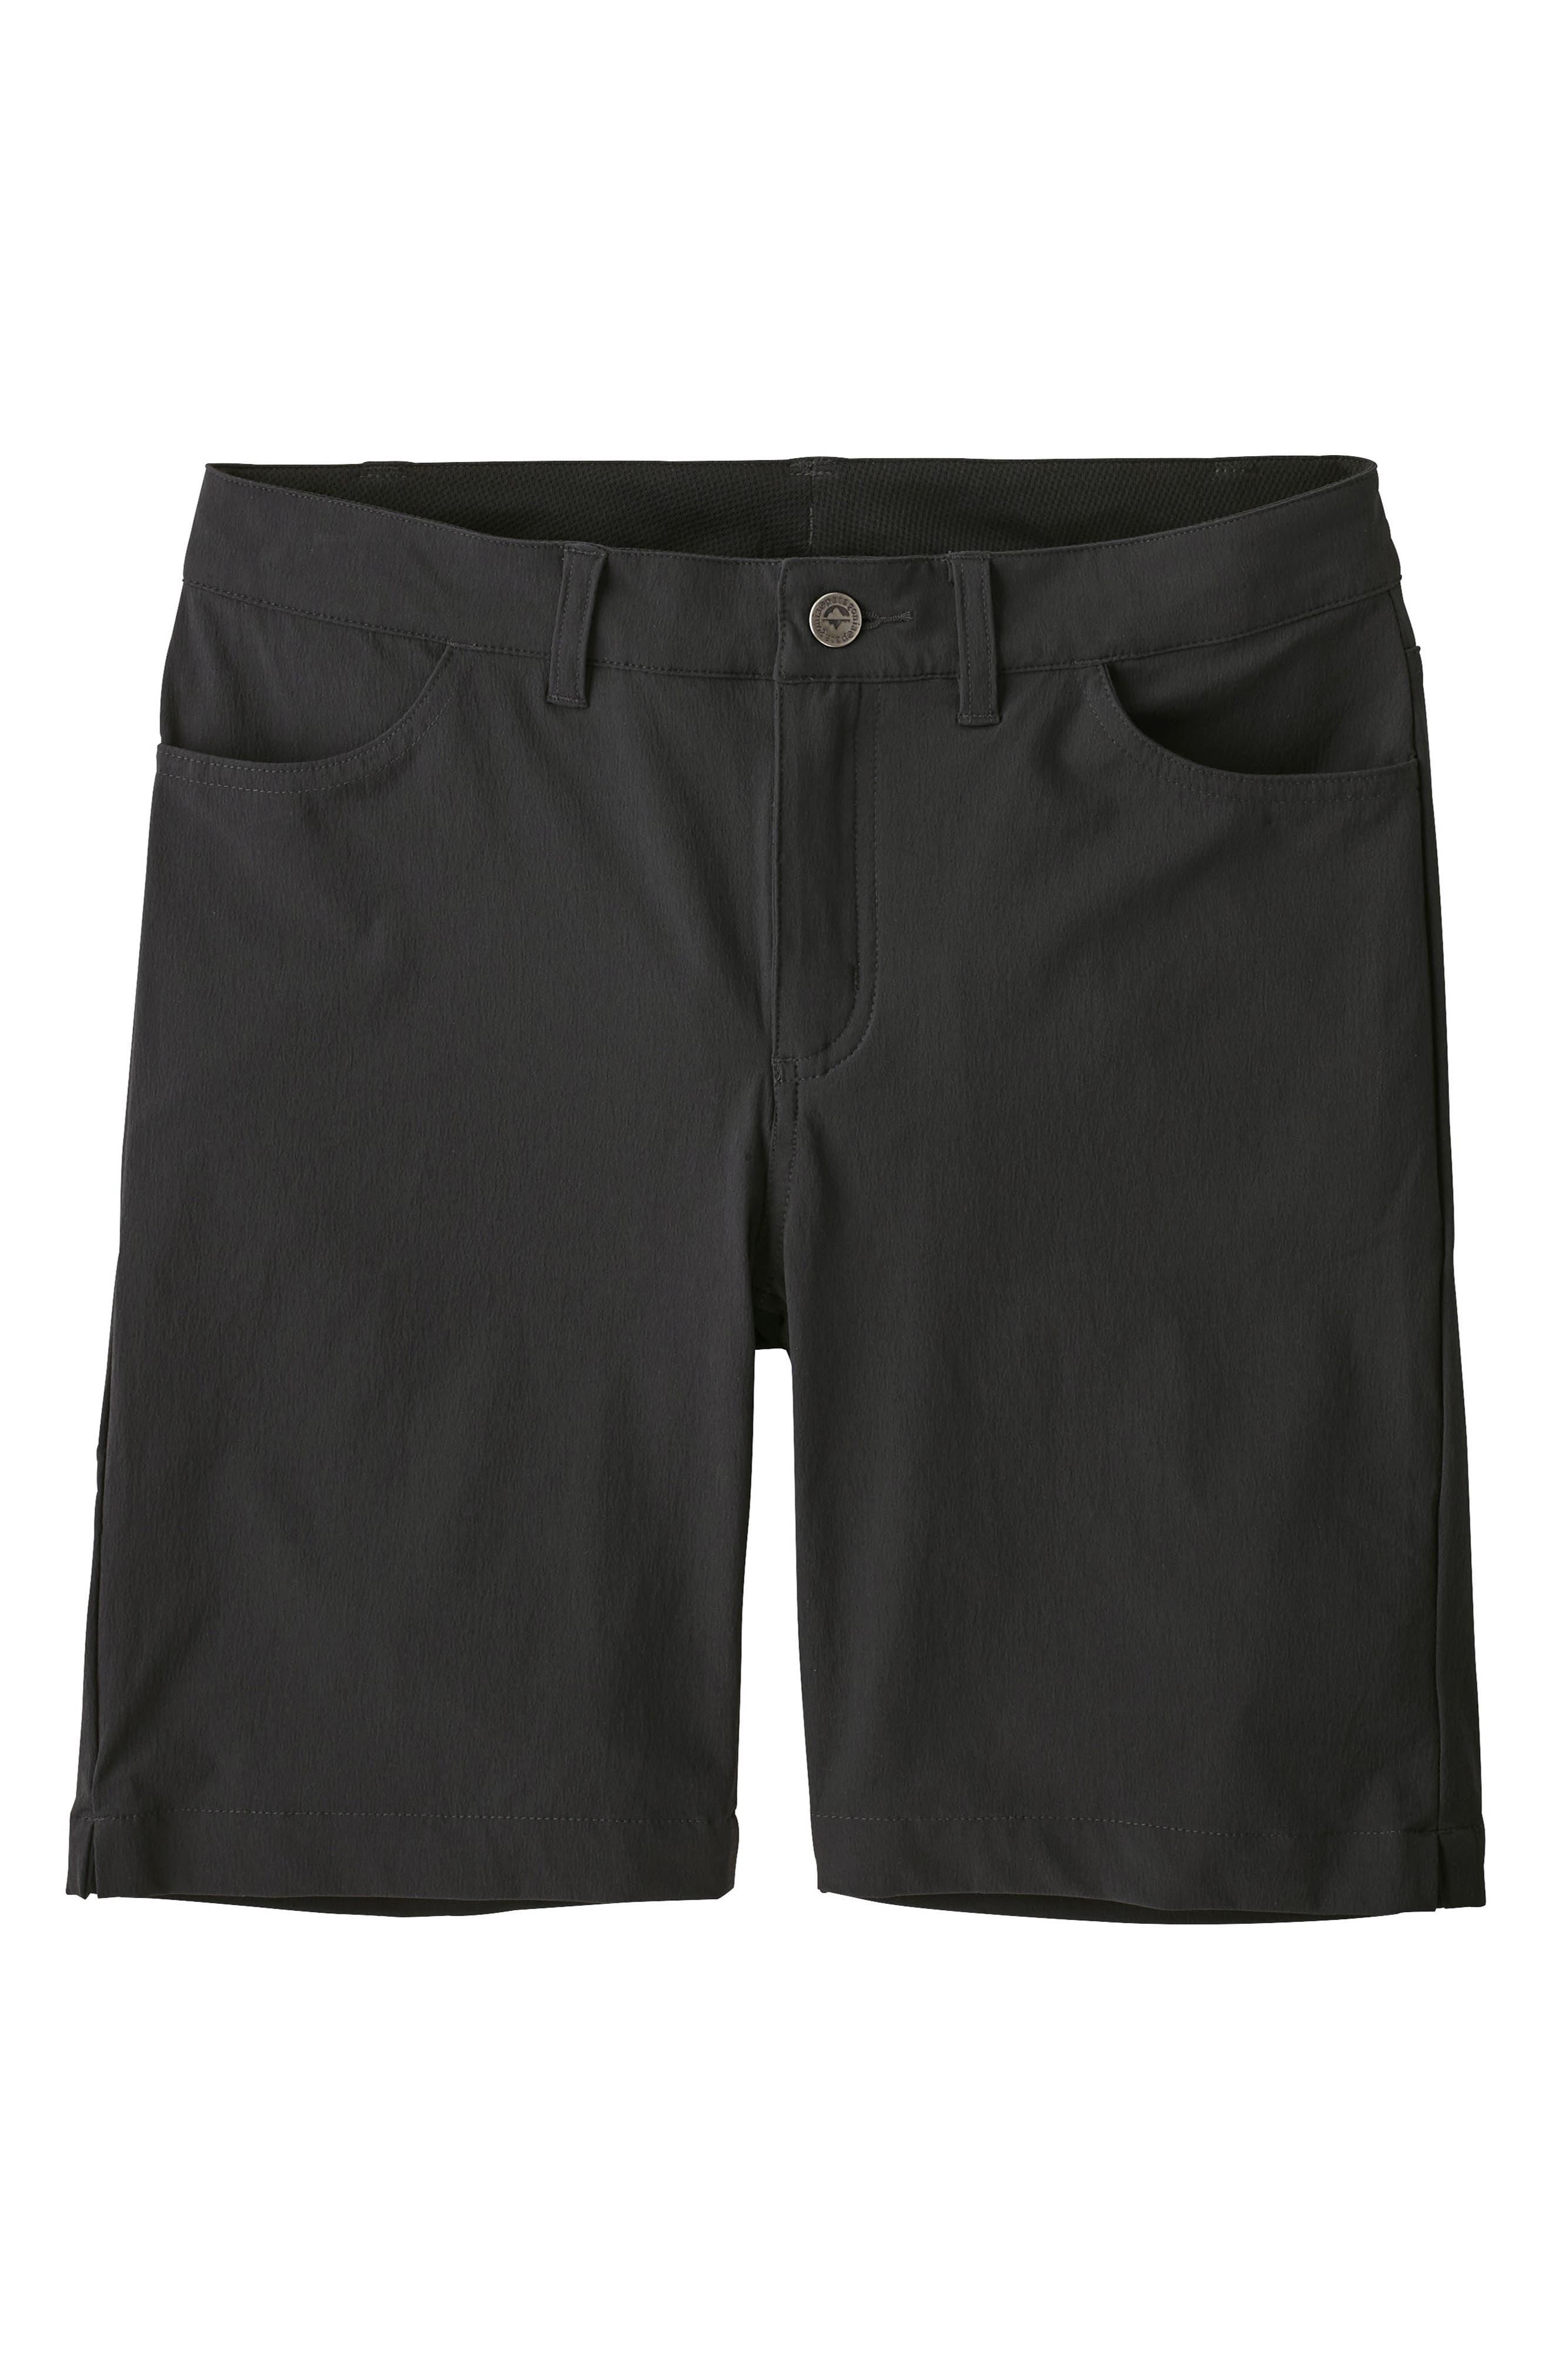 Patagonia Skyline Traveler Shorts, Black